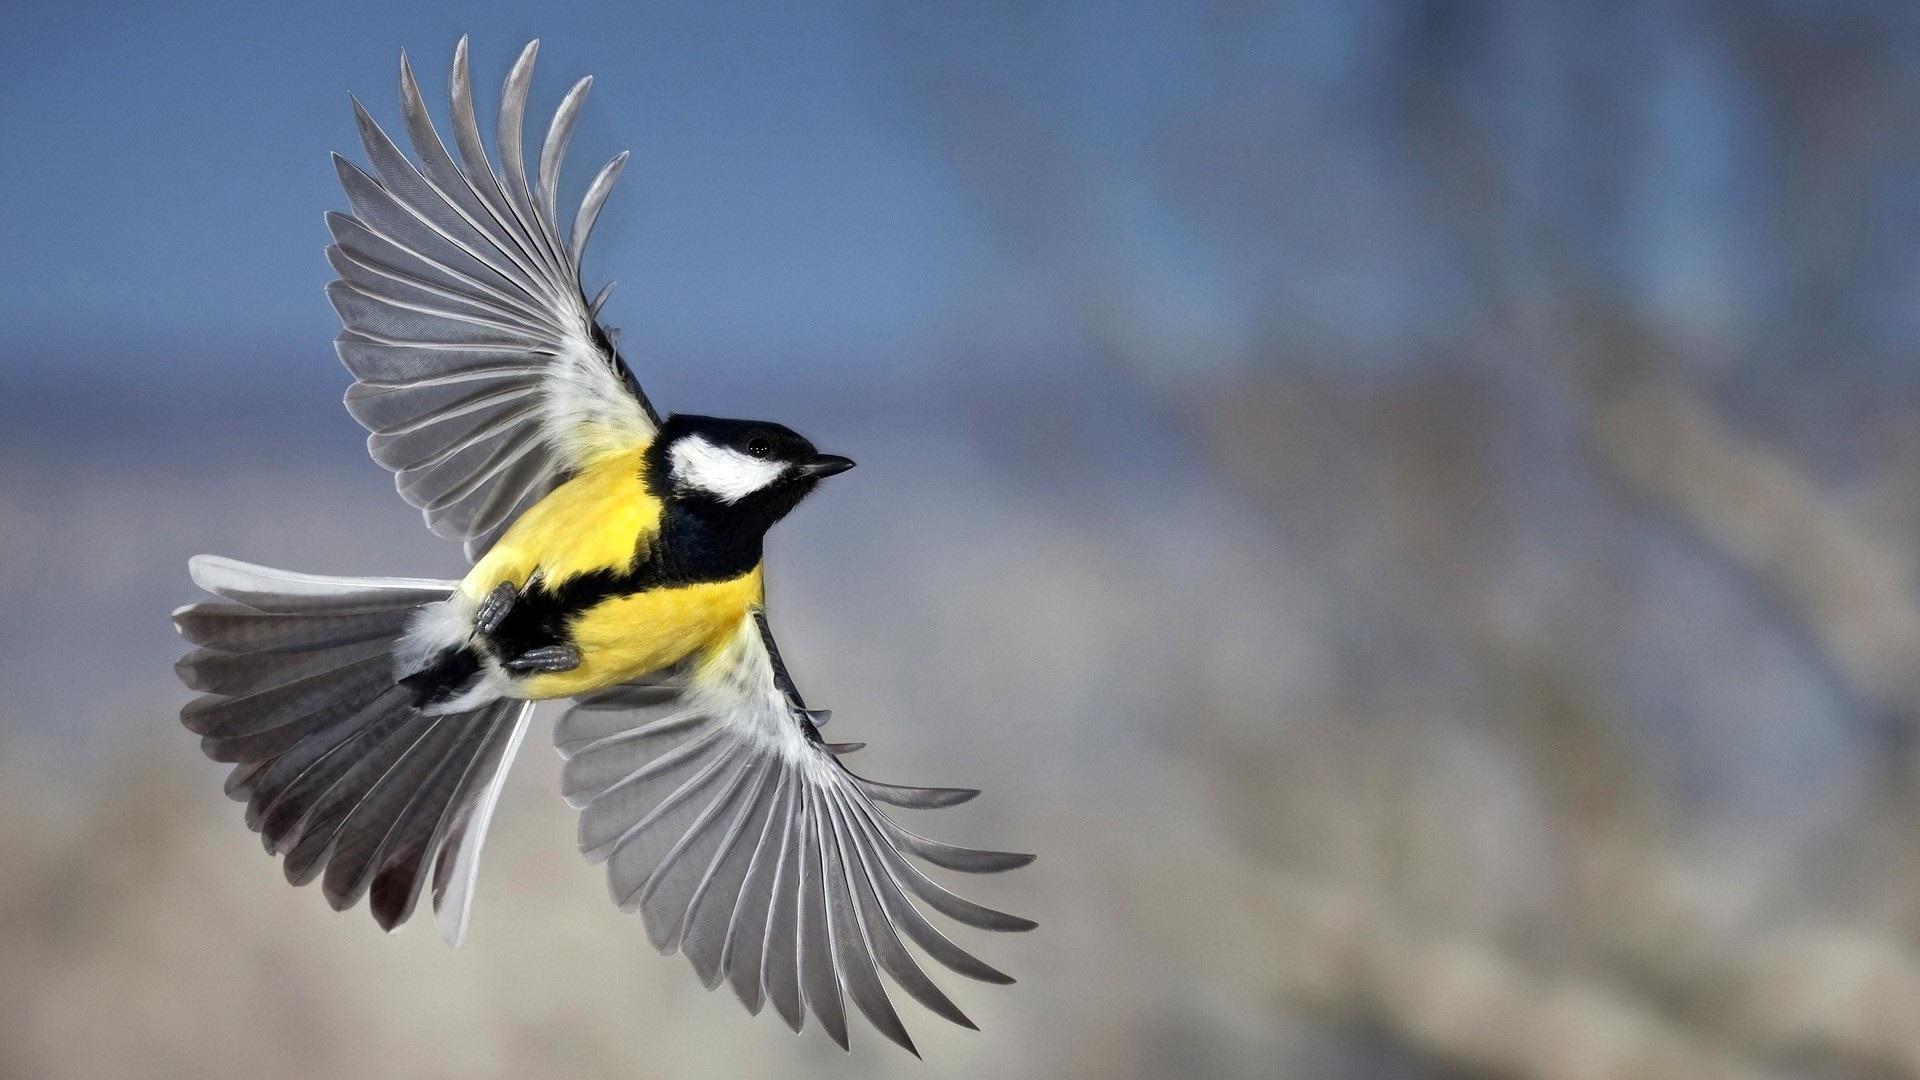 bird-wallpapers-25396-741340.jpg